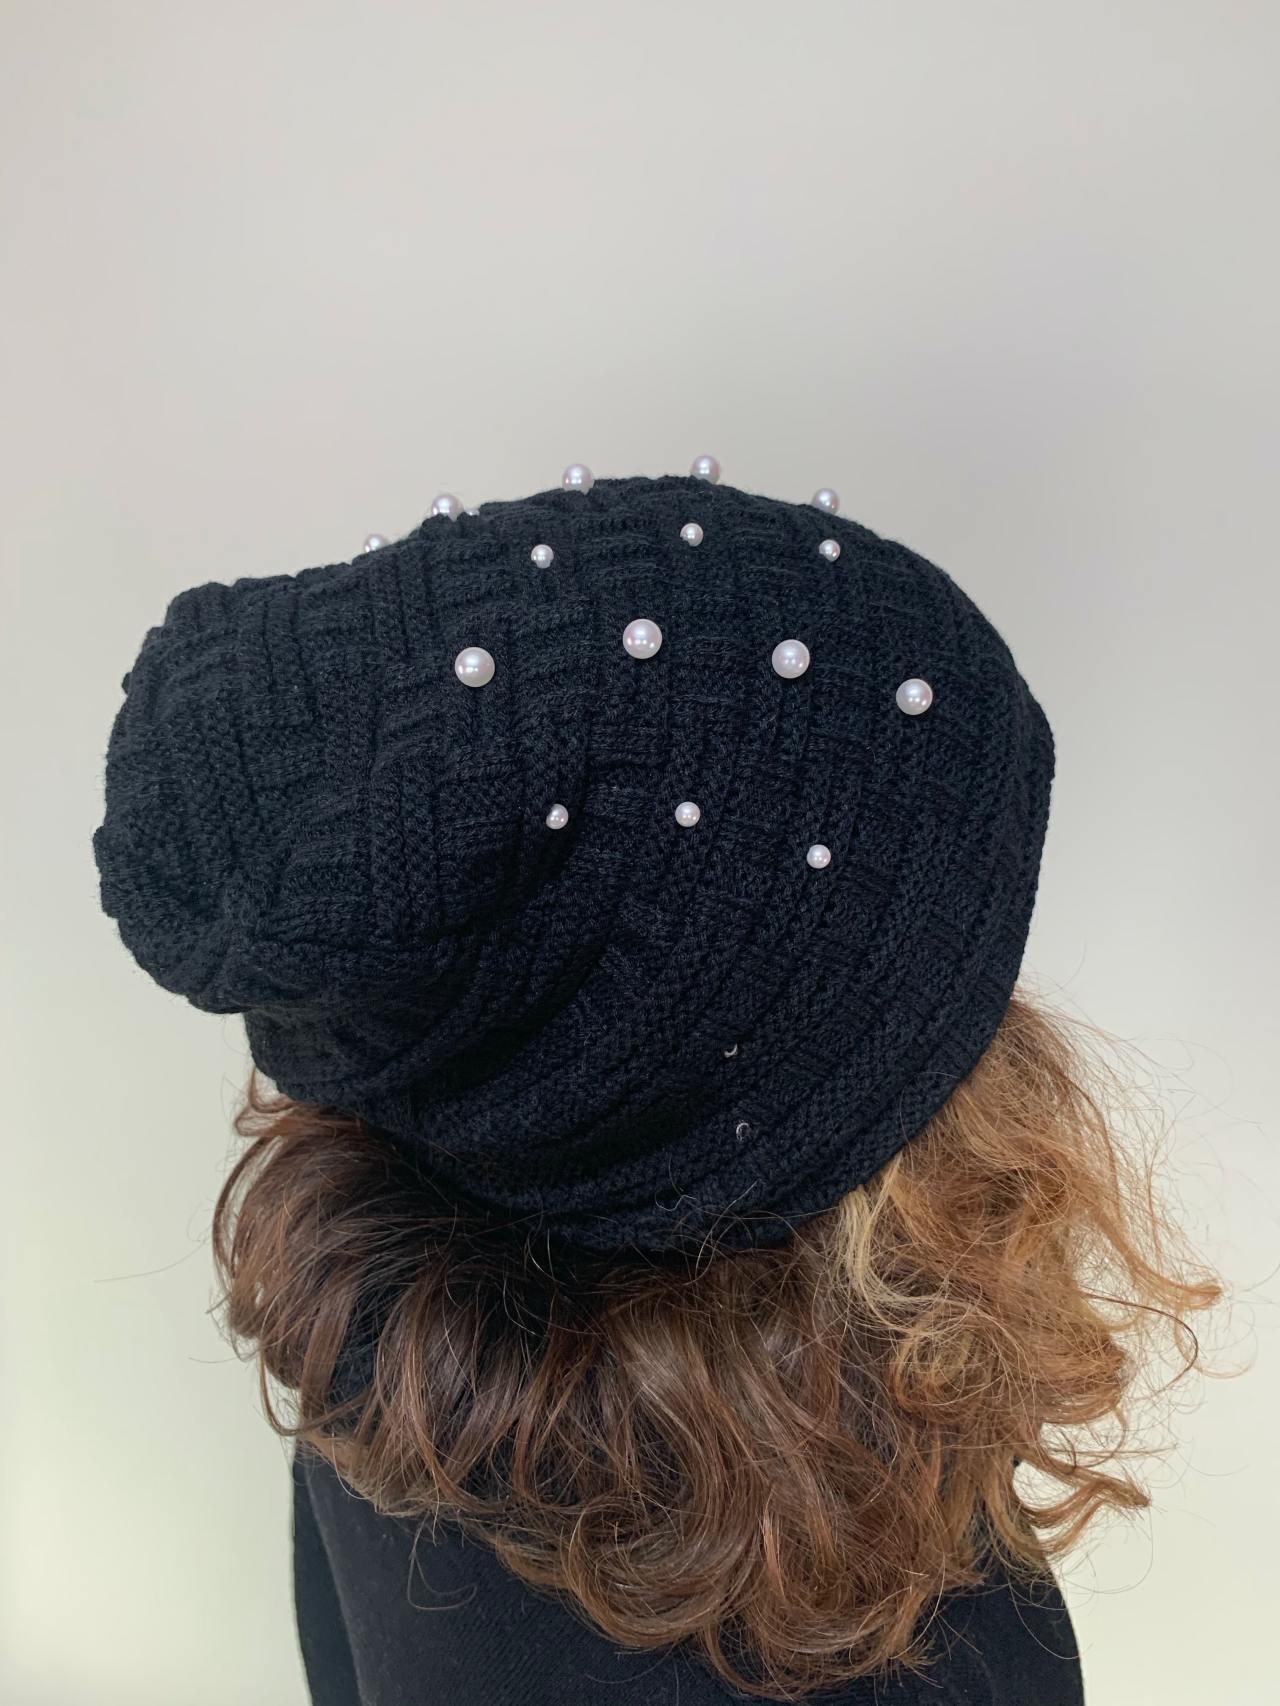 Komplet čepice a nákrčník s perličkami černý -02